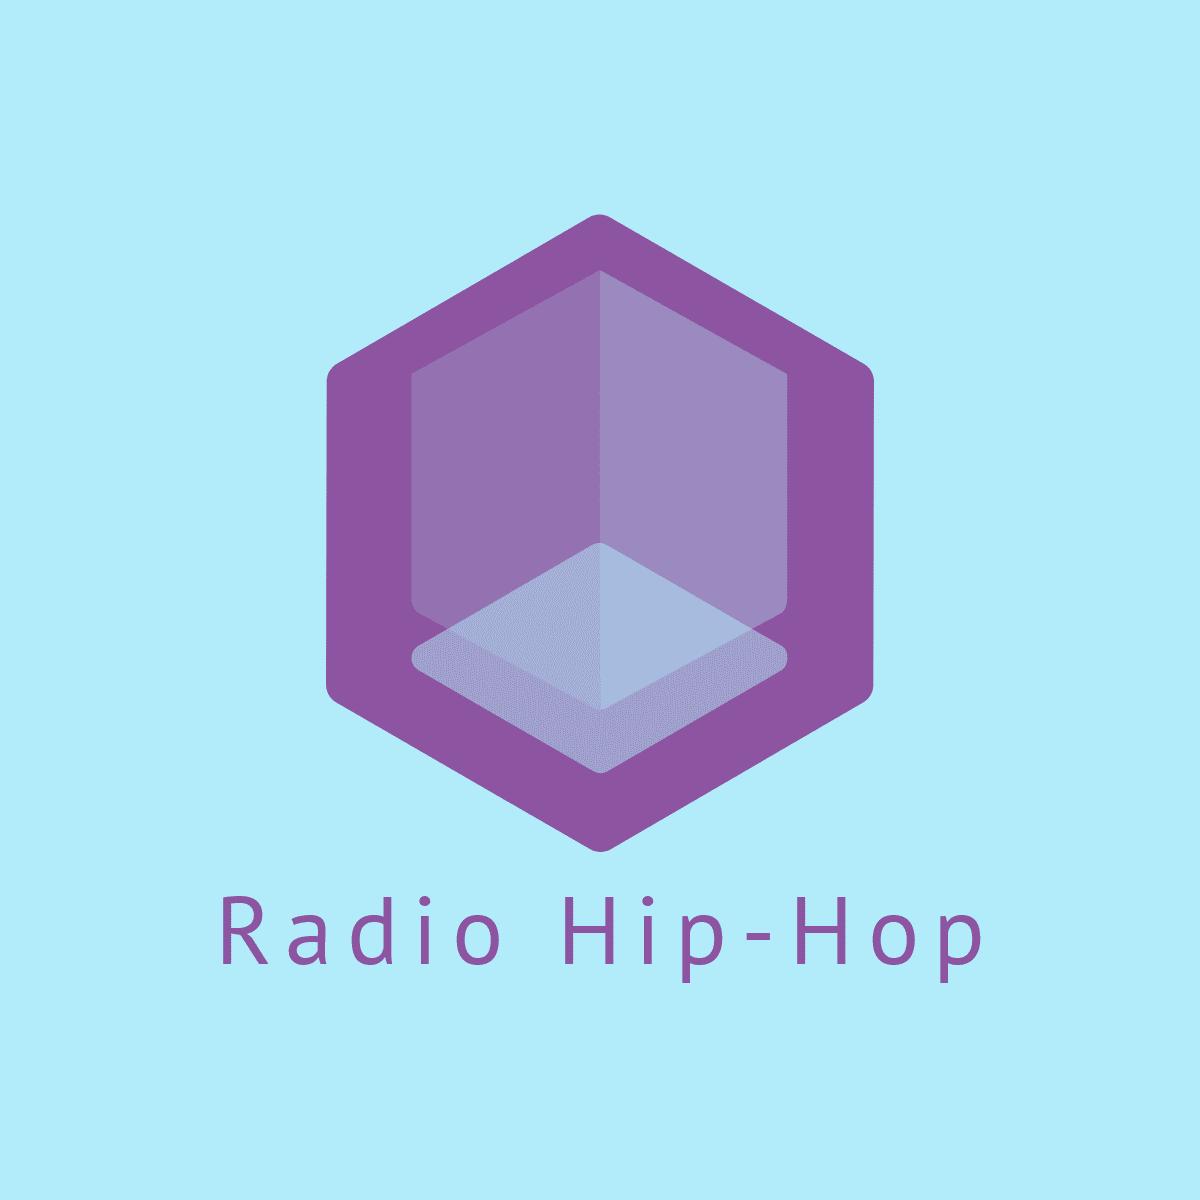 Radio Hip-Hop